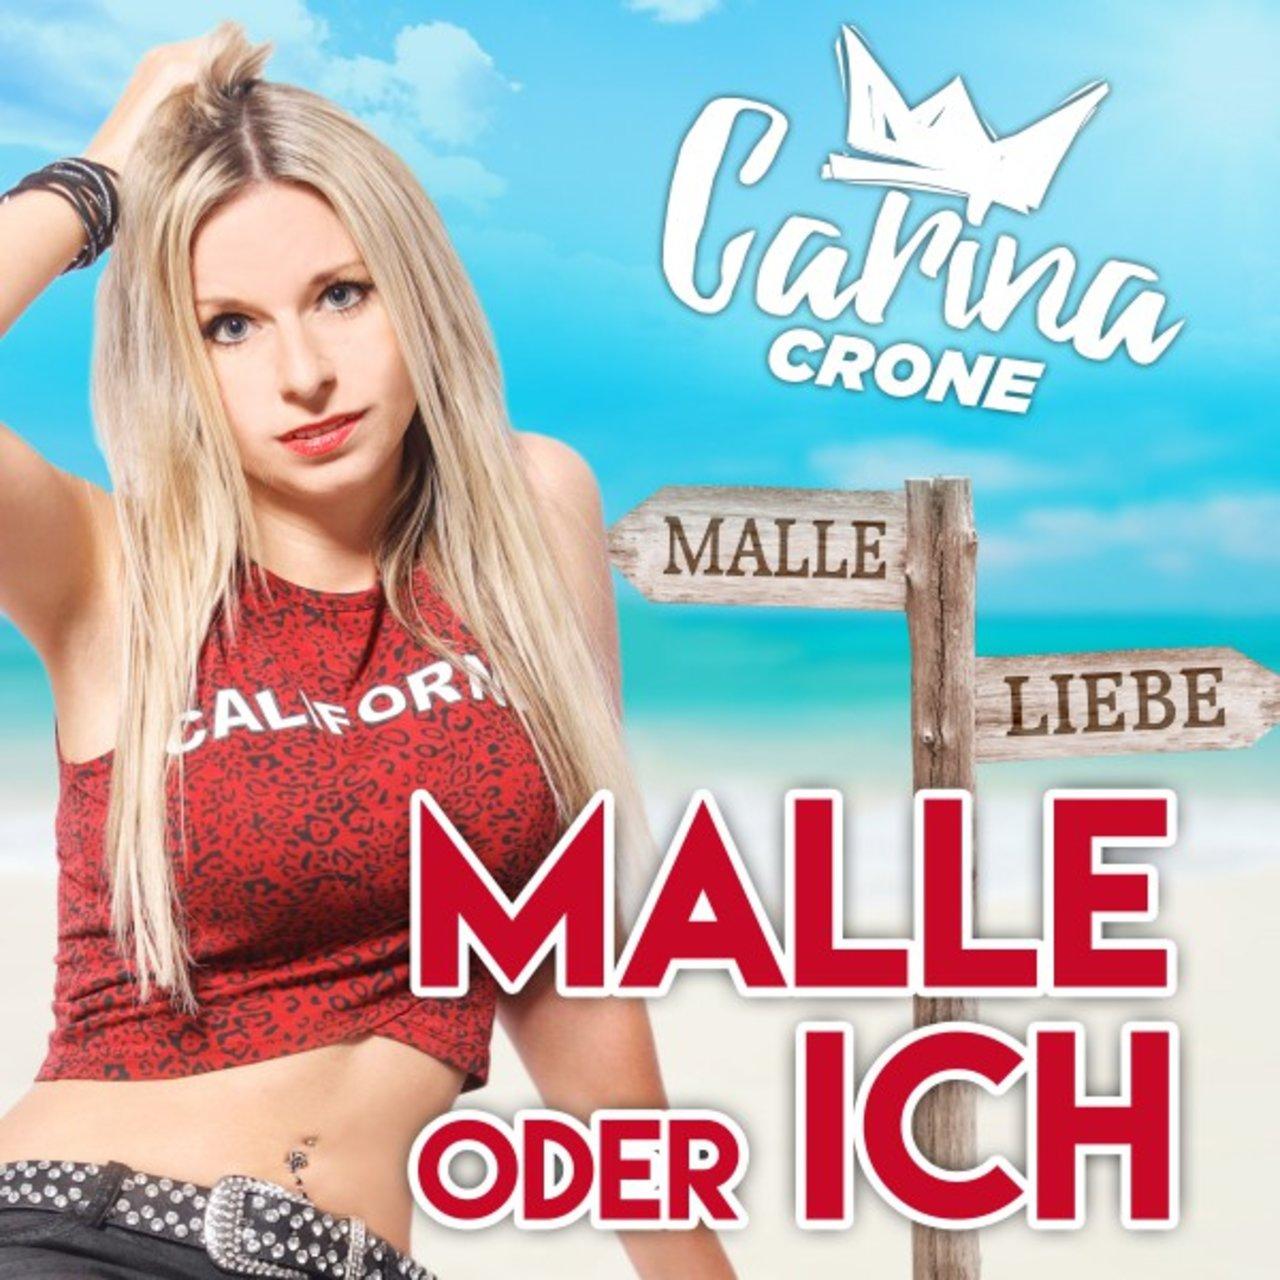 TIDAL: Listen to Carina Crone on TIDAL